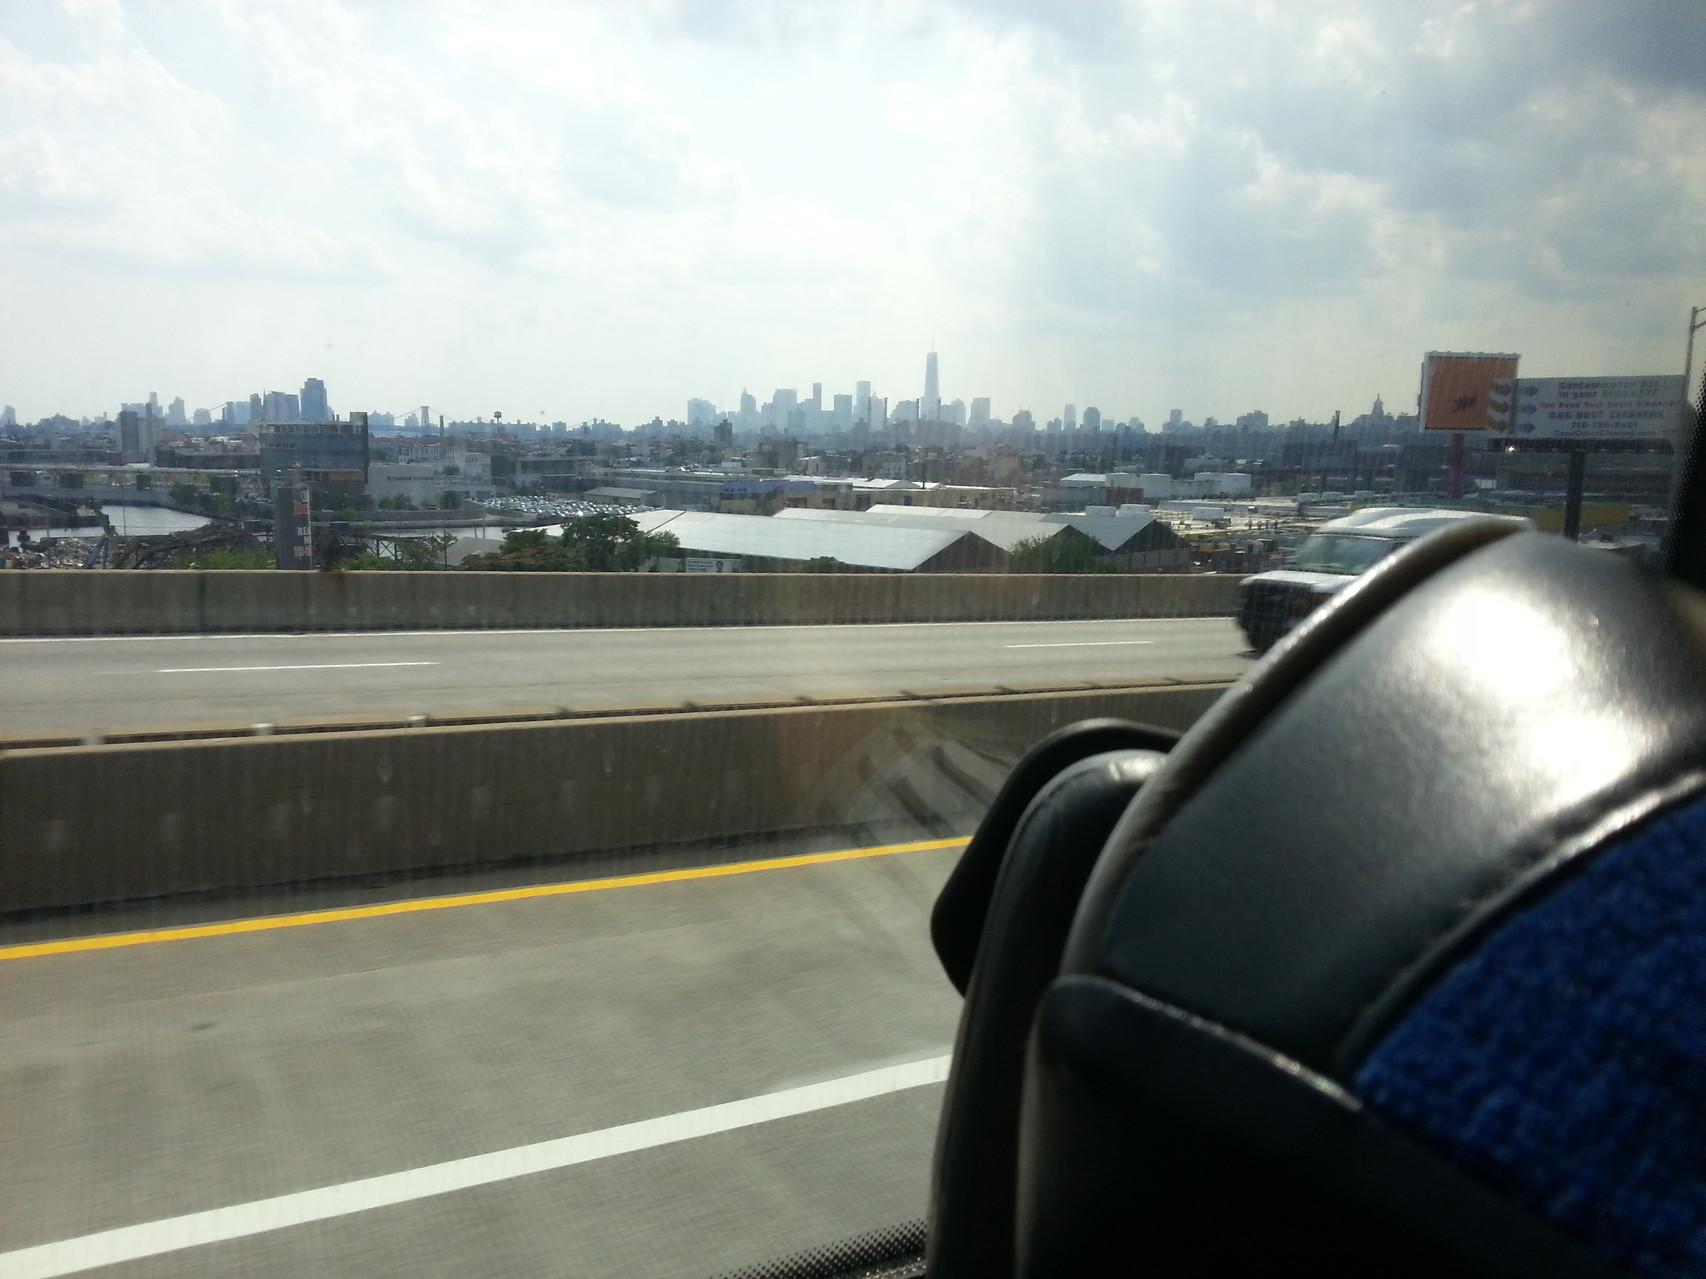 Skyline of NYC